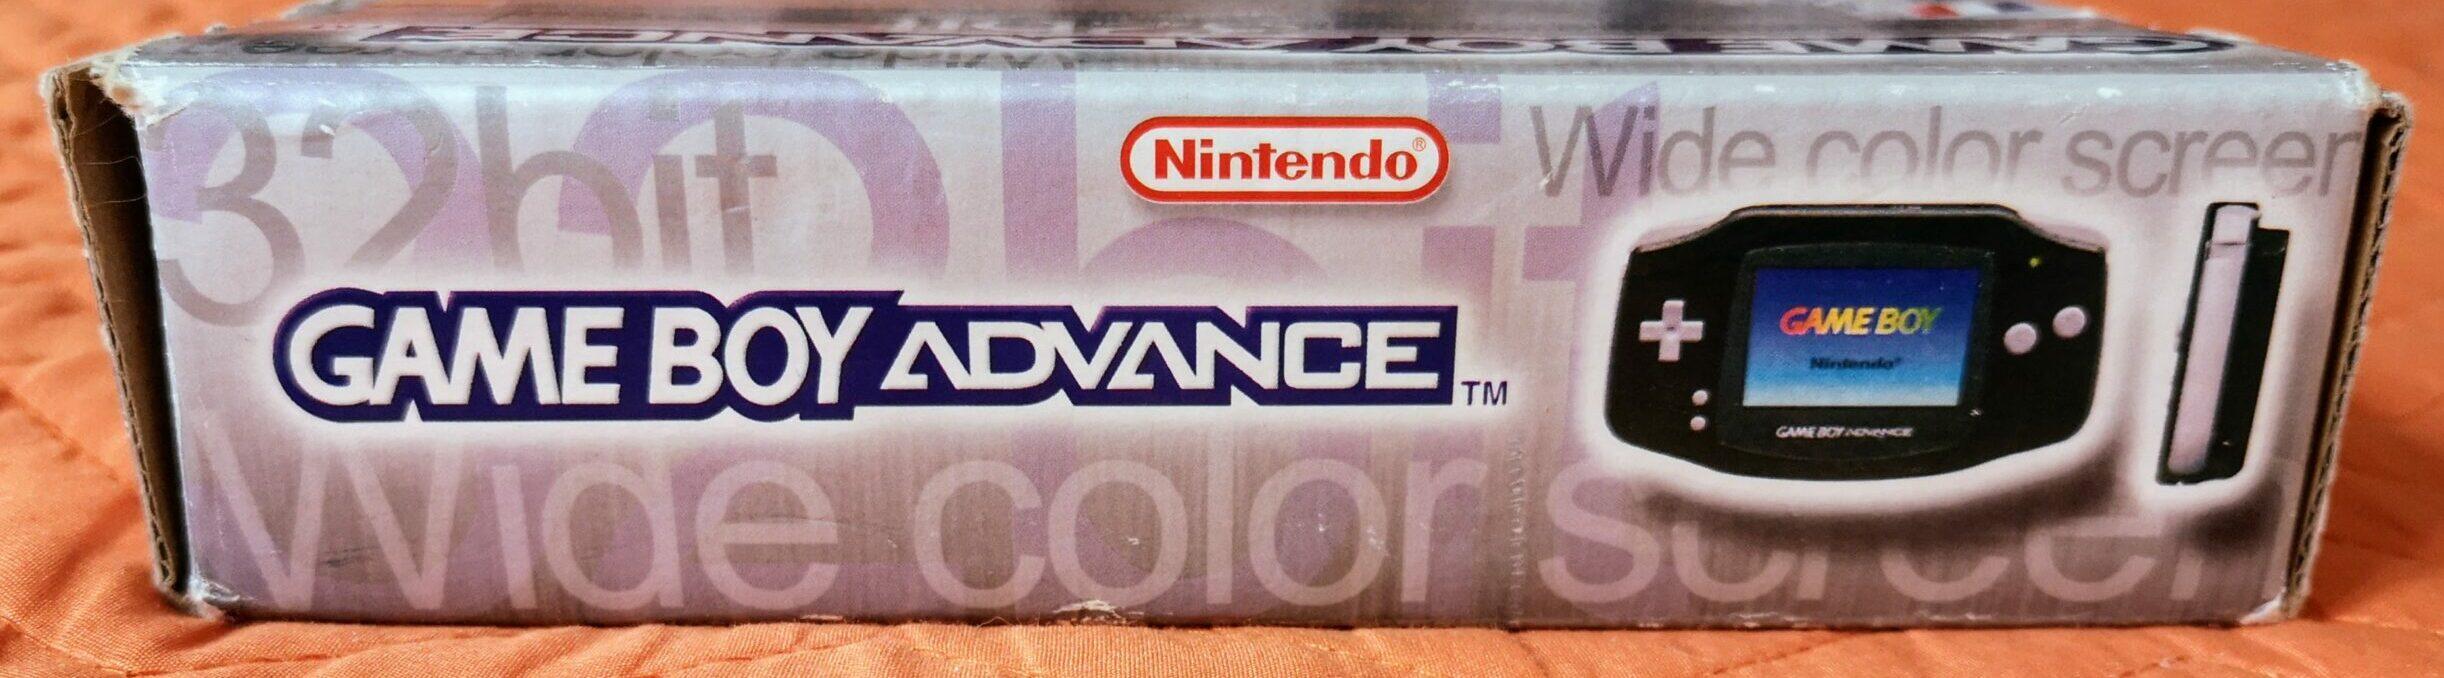 Game Boy Advance, scatola lato 2